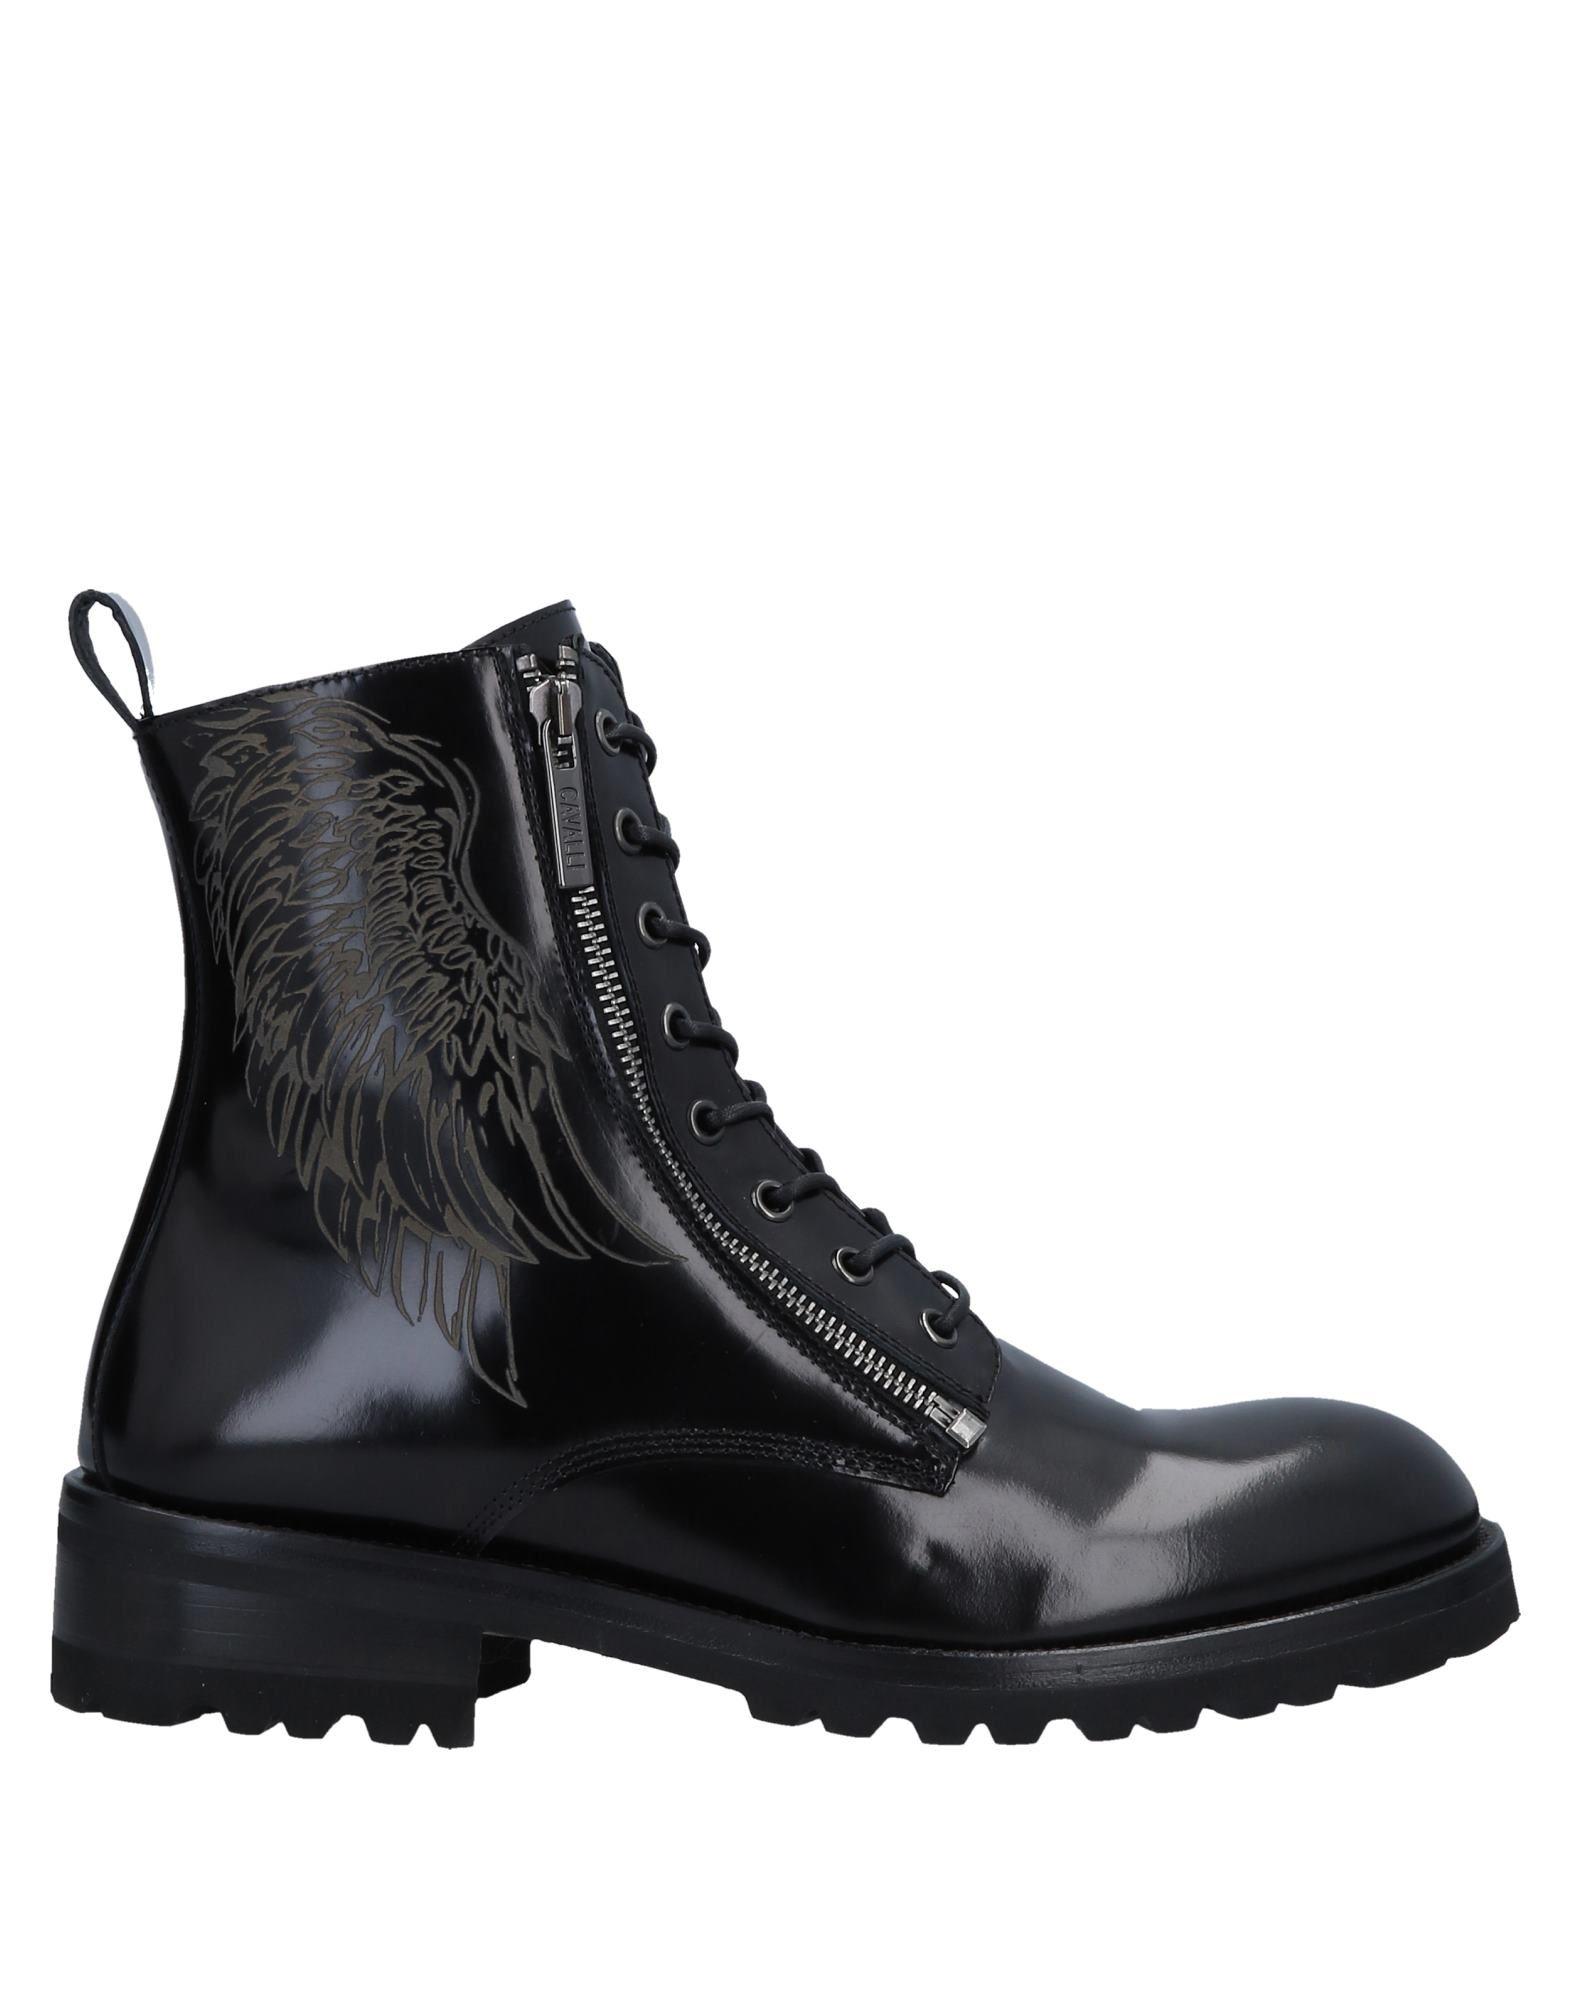 Roberto Cavalli Boots - Men on Roberto Cavalli Boots online on Men  United Kingdom - 11577143CL 1a9811